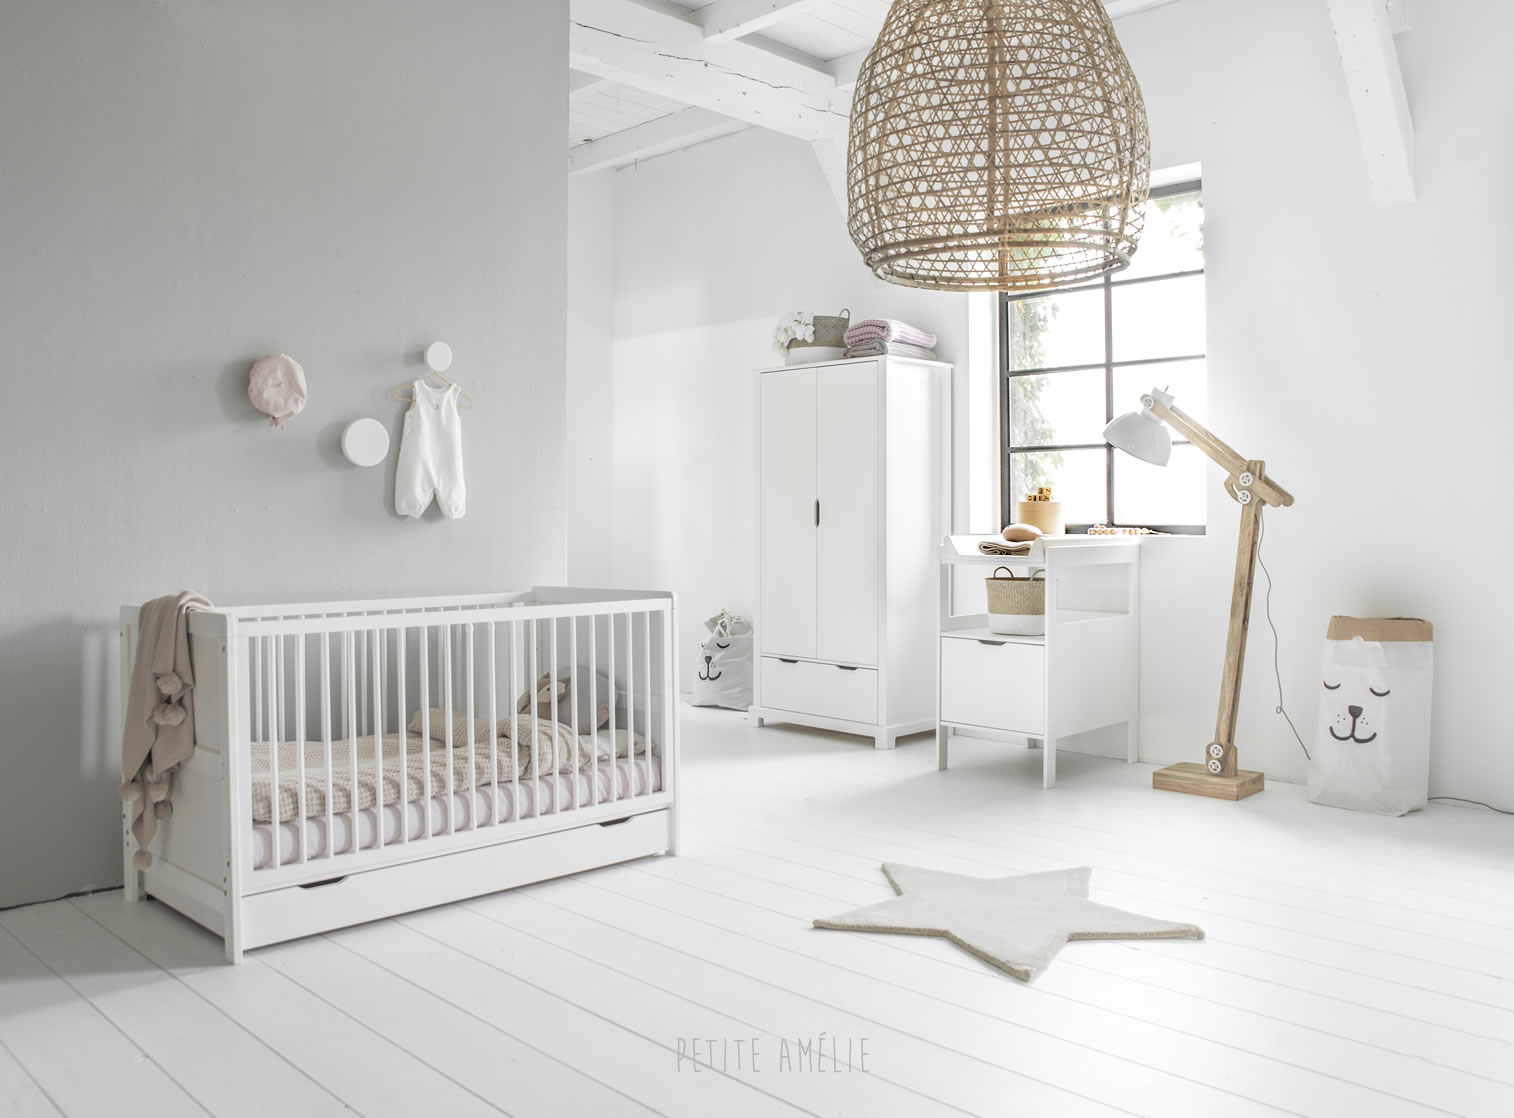 babykamer-compleet-vintage-wit-petite-amelie